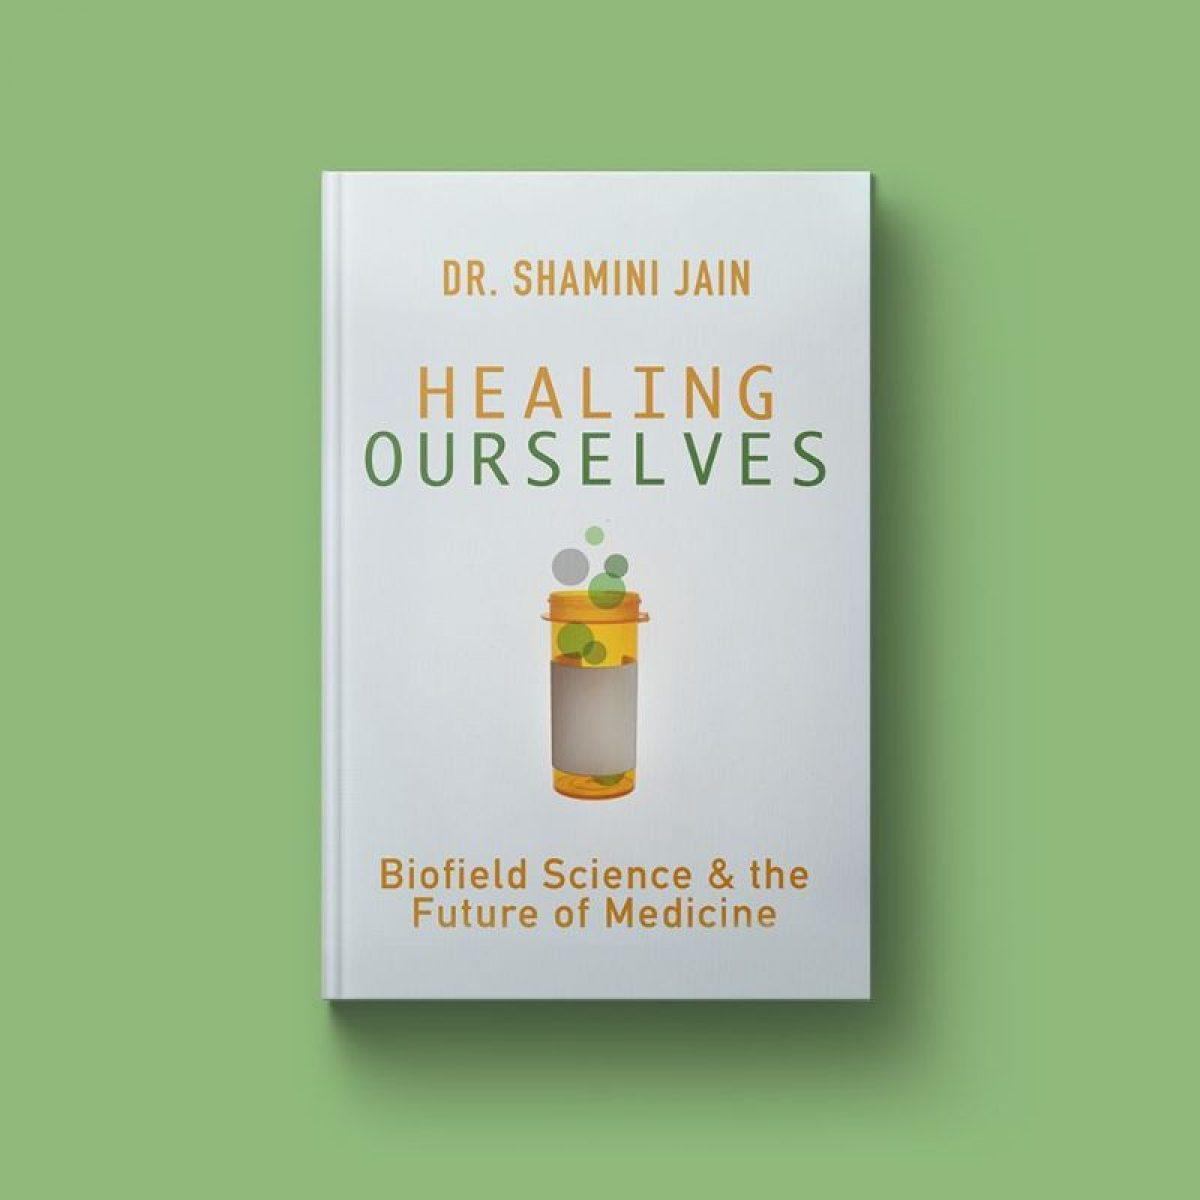 healing-ourselves-shamini-jain-cover-art-3